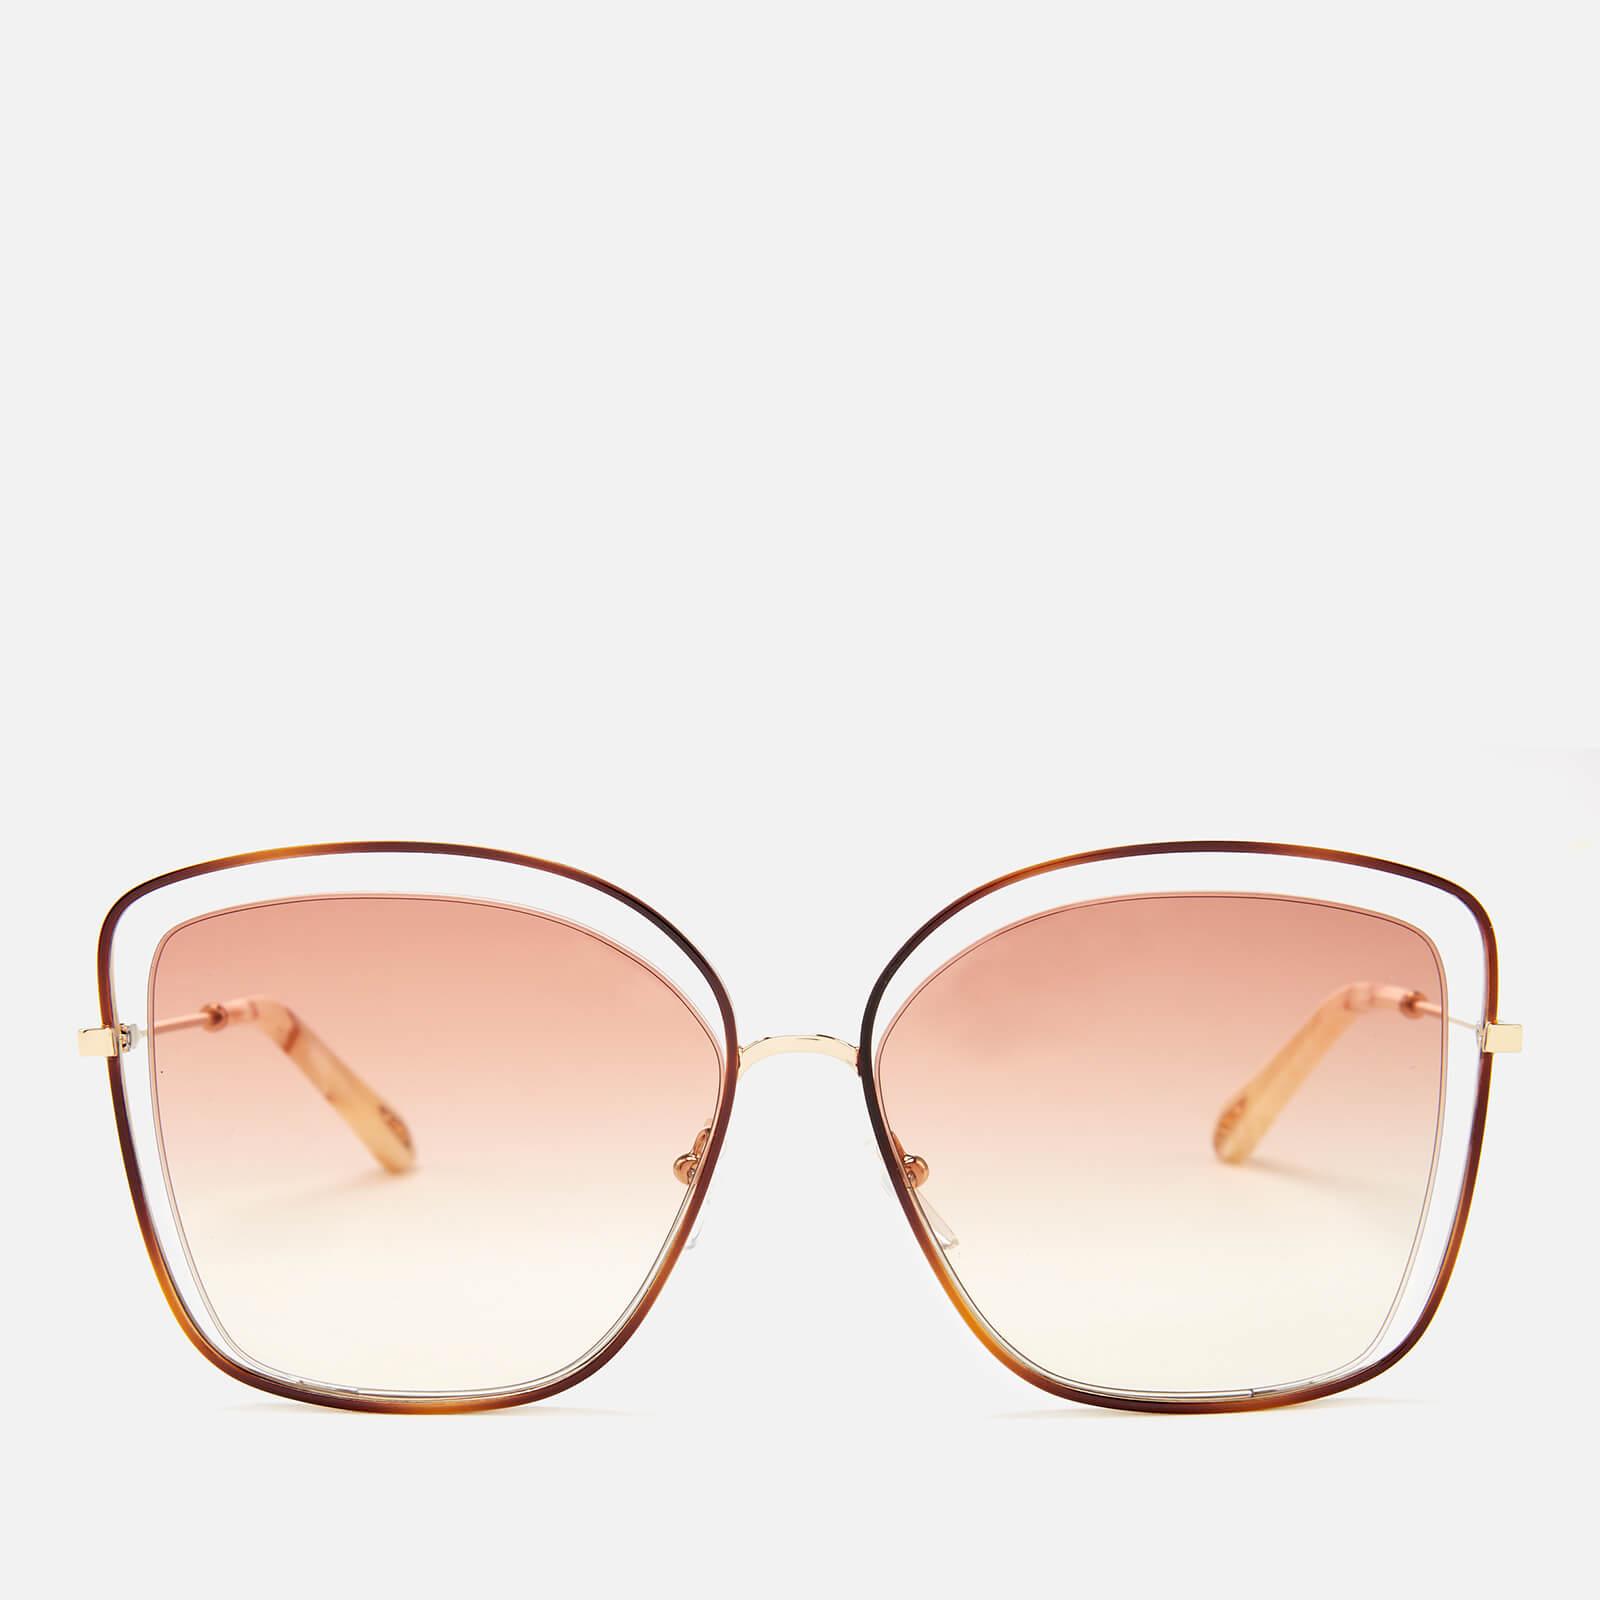 6aef195360c Chloe Women s Poppy Sunglasses - Havanna Peach - Free UK Delivery ...